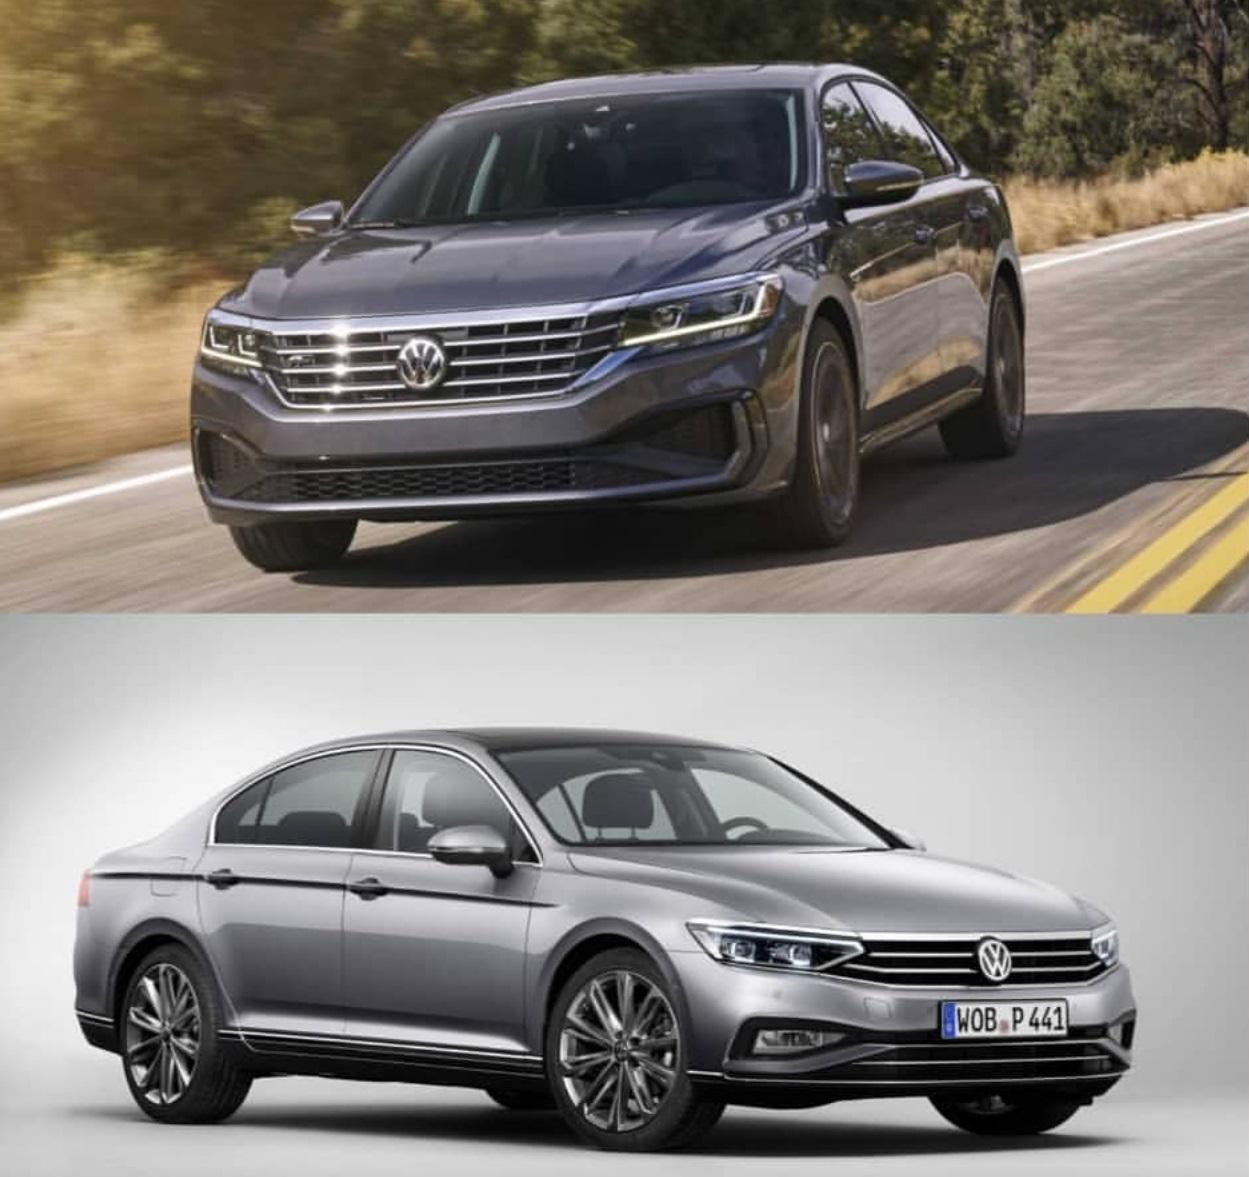 2020 Volkswagen Passat Karşılaştırma, Yeni Passat